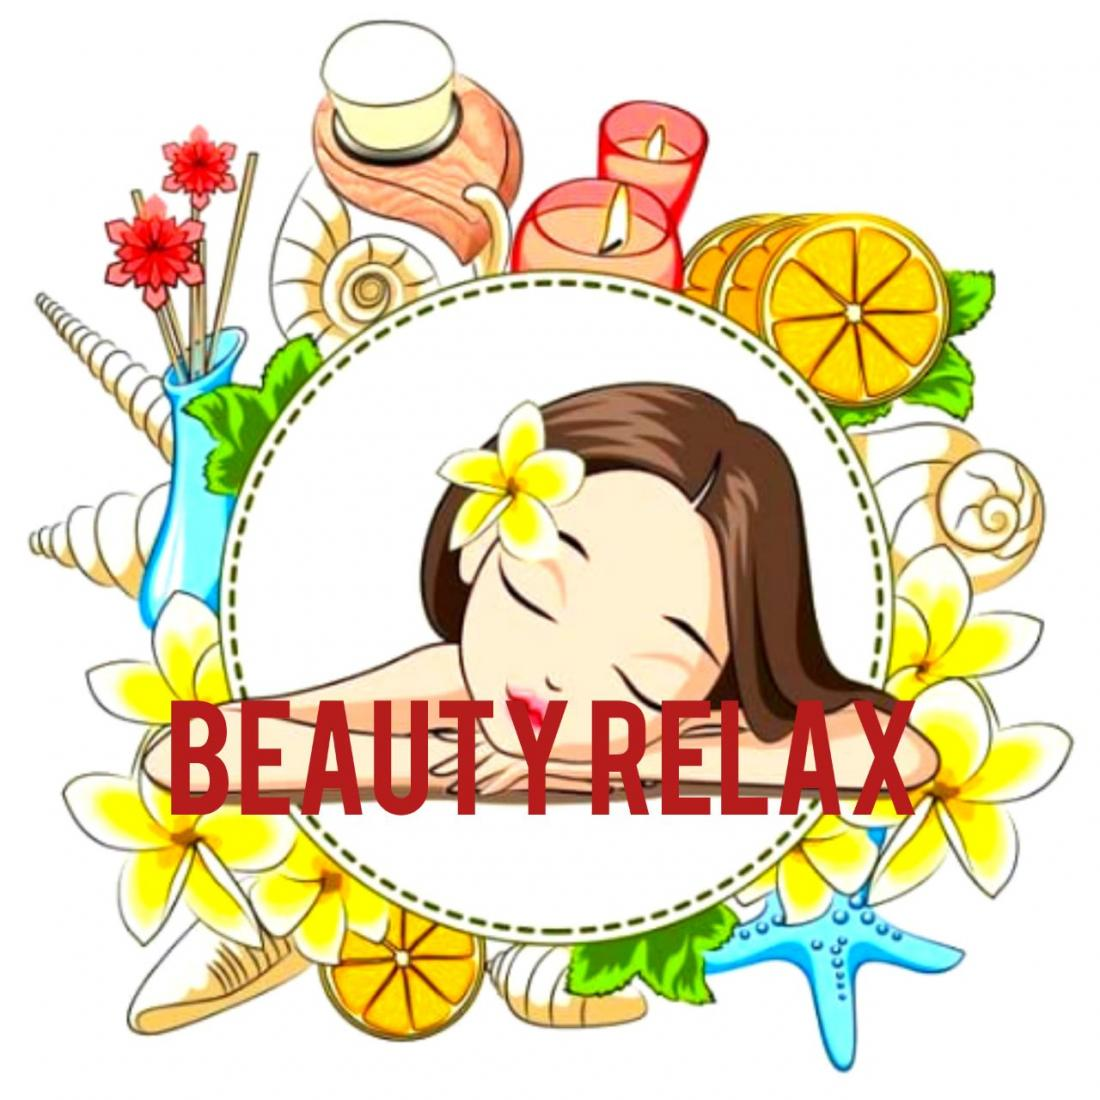 "Массажи лица, чистки, пилинги, маски от 4,90 руб. в салоне красоты ""Beauty relax"" в Гомеле"